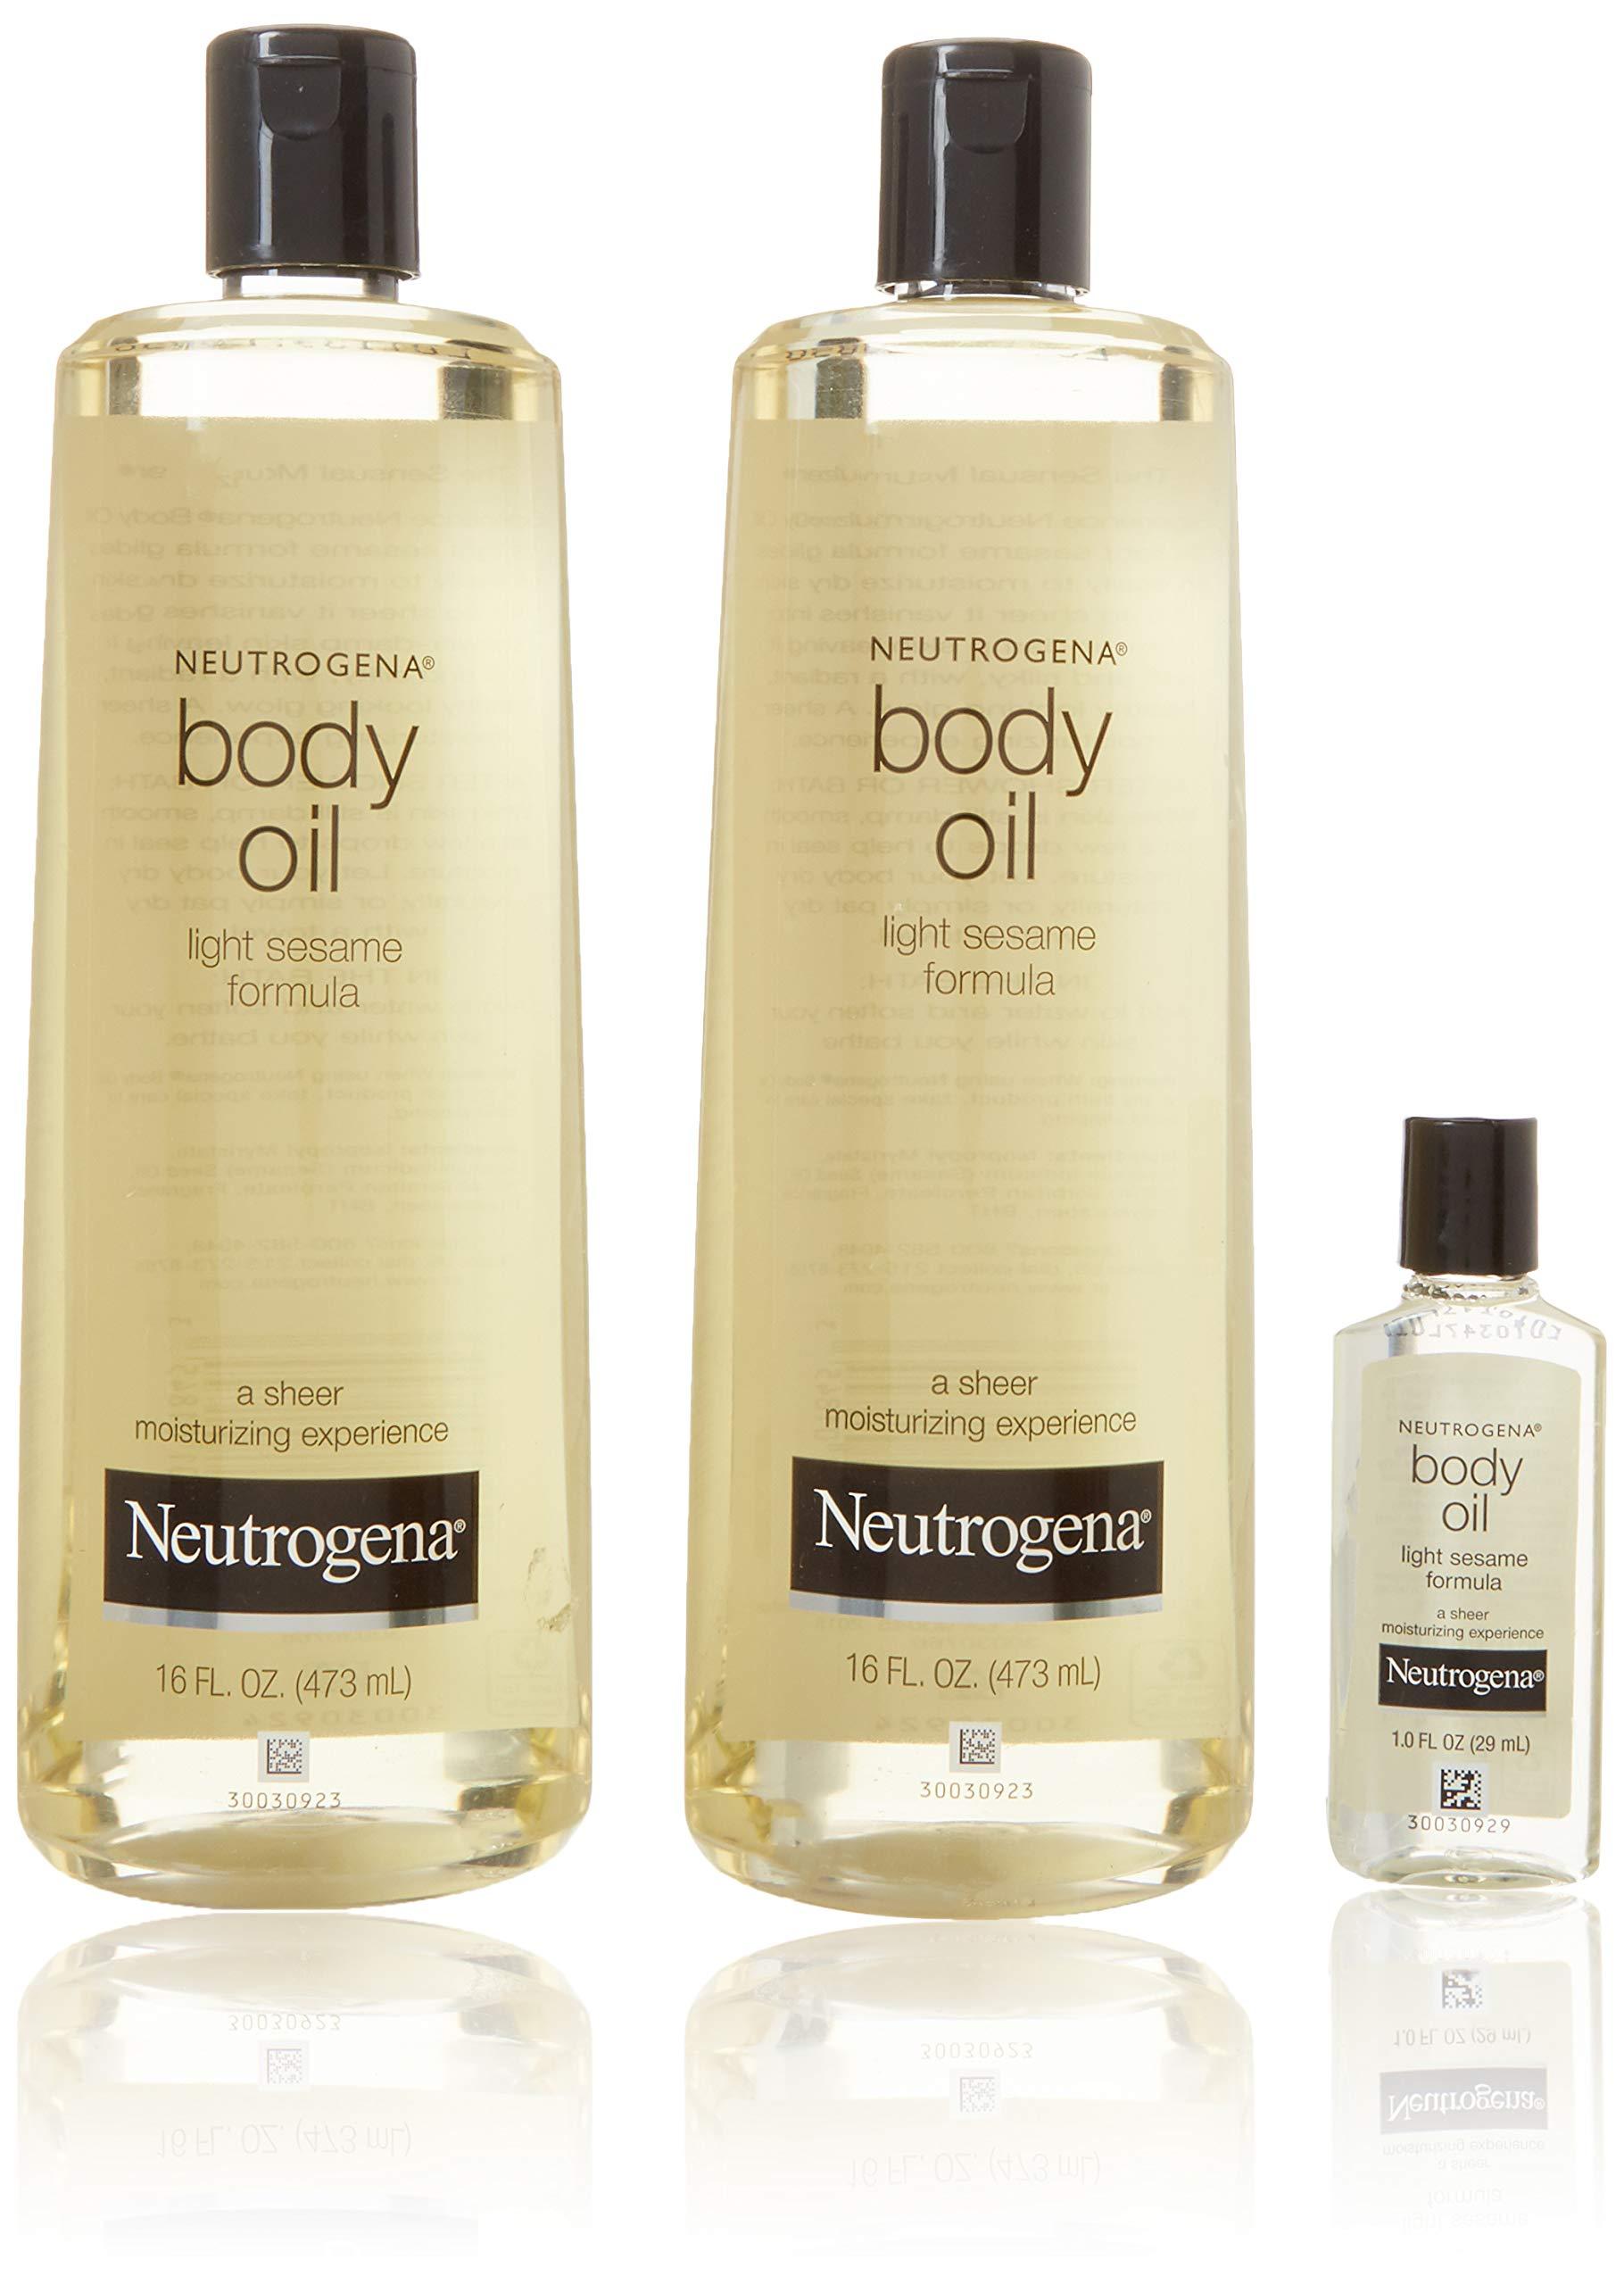 2 Pack of Neutrogena Body Oil Light Sesame Formula, 2-16 fl. oz bottles, Total of 32 fl. oz. by Neutrogena